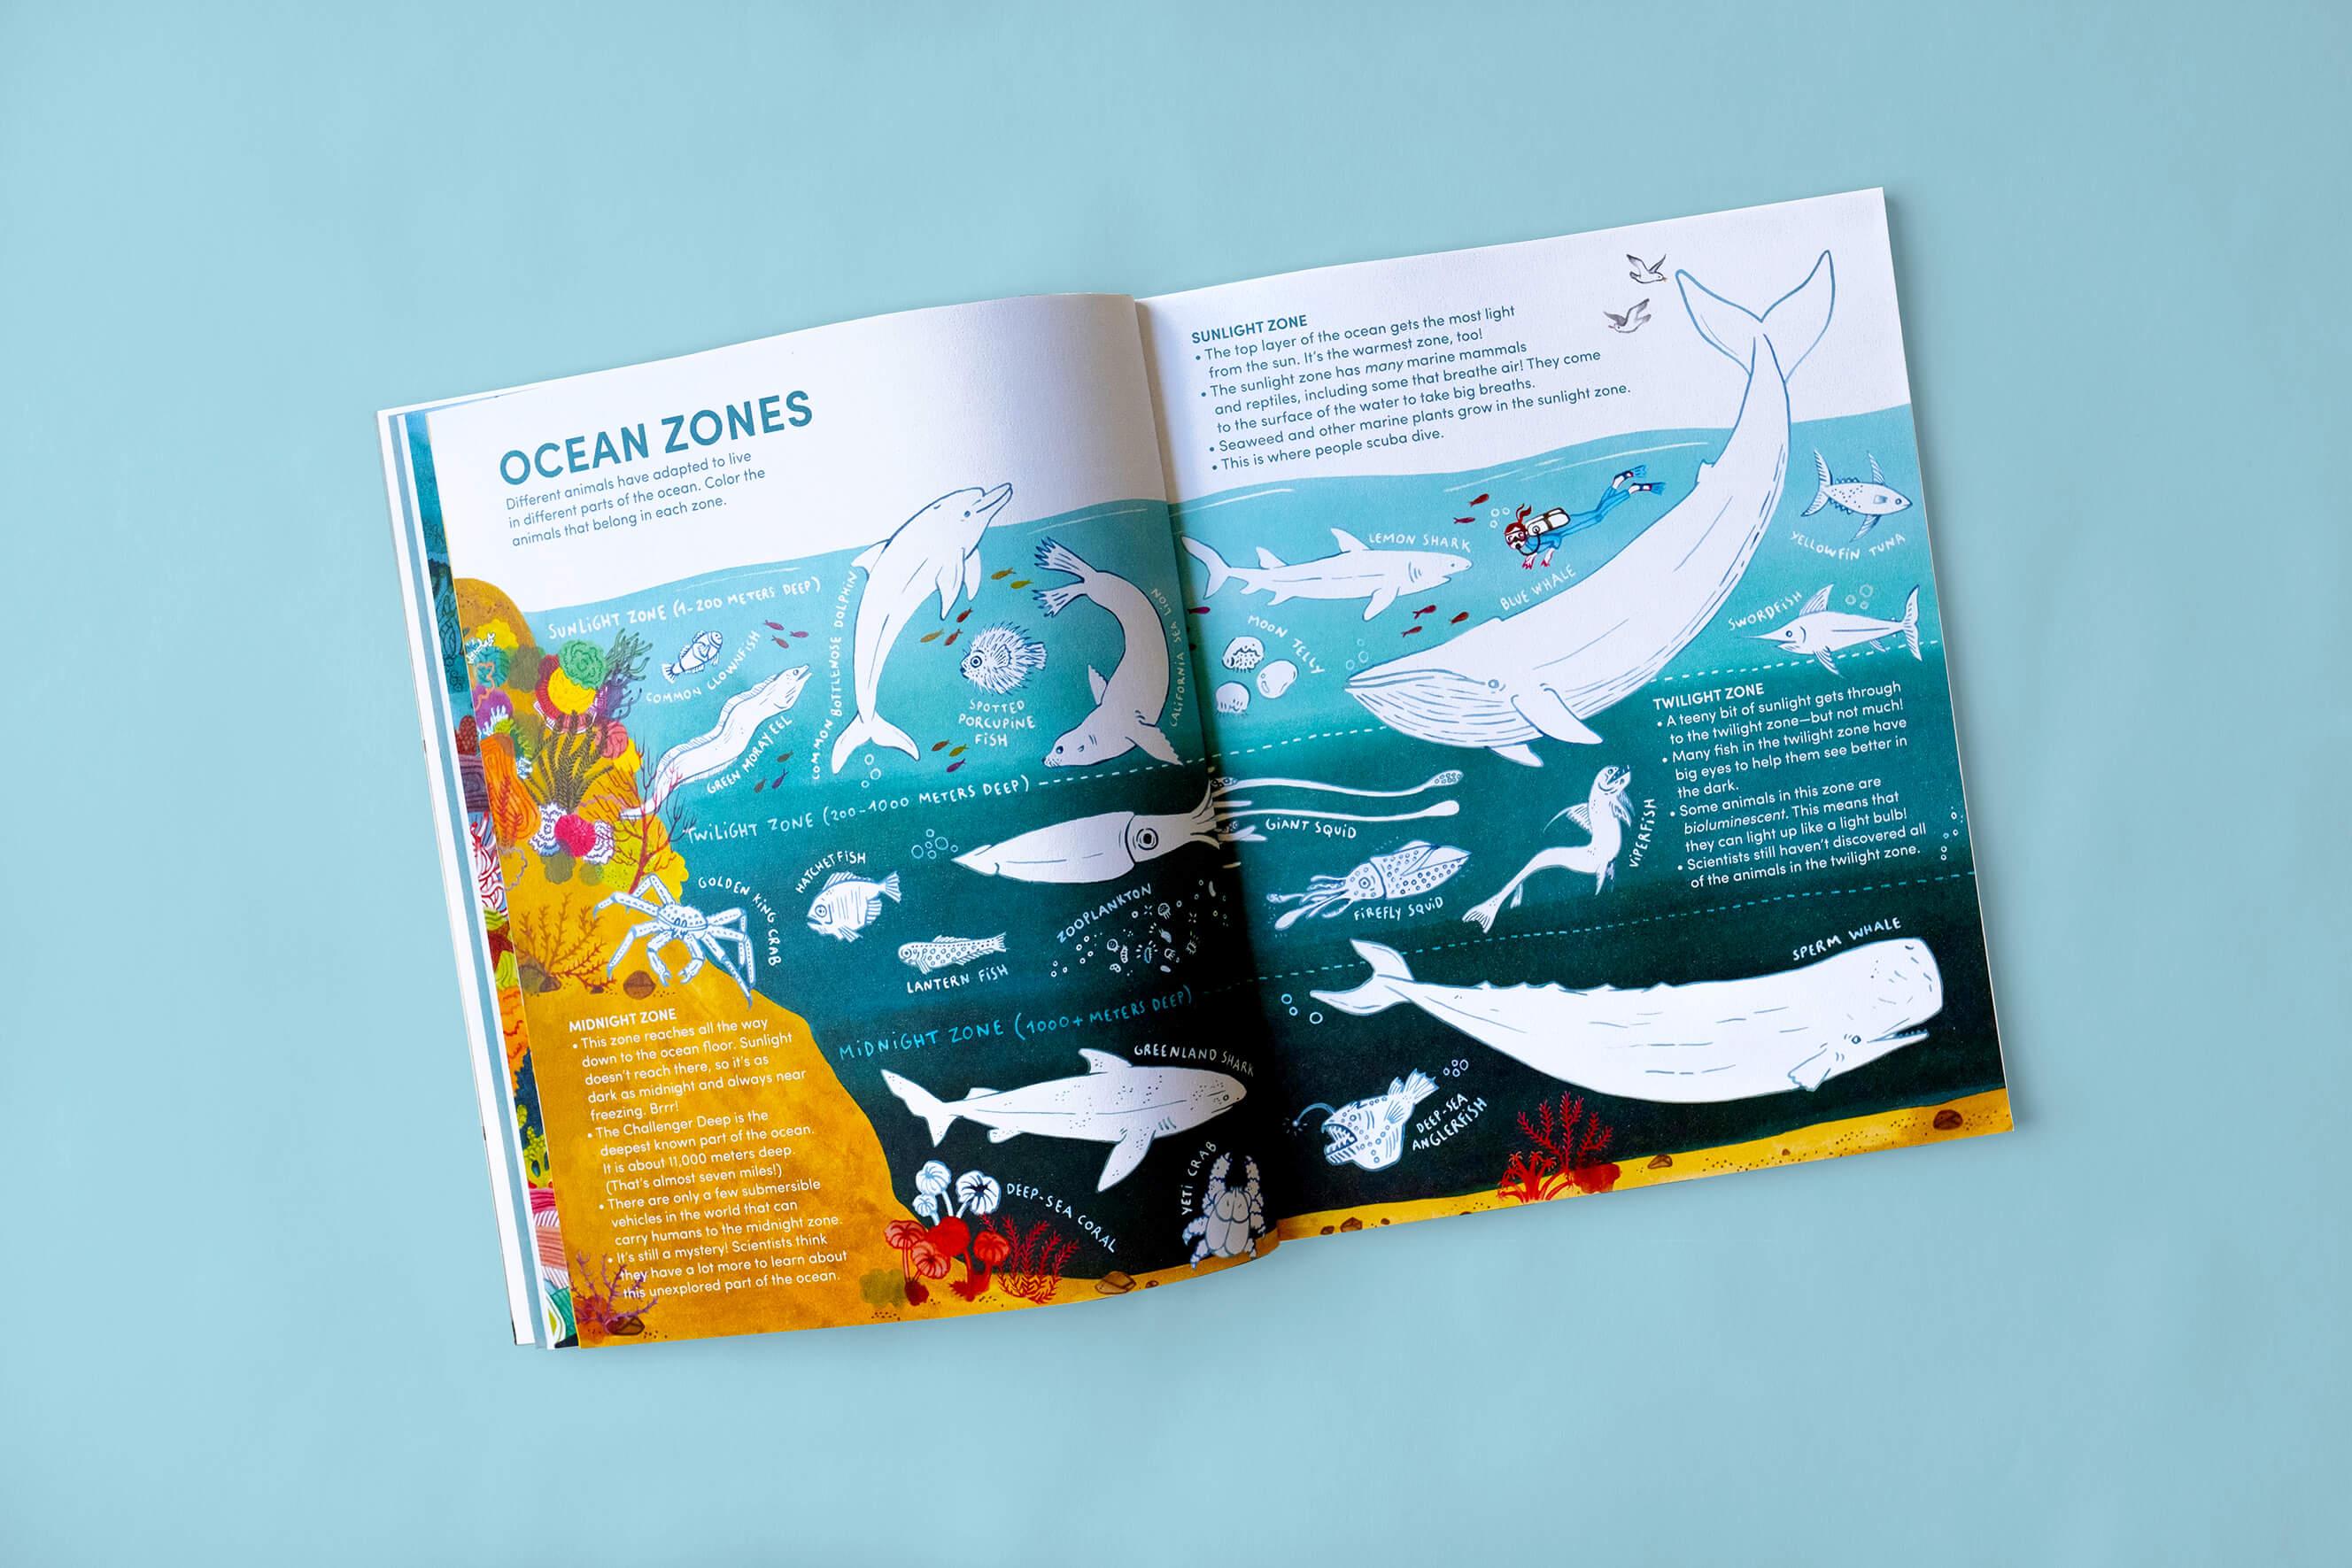 Kid's magazine open on an illustration of the ocean's zones